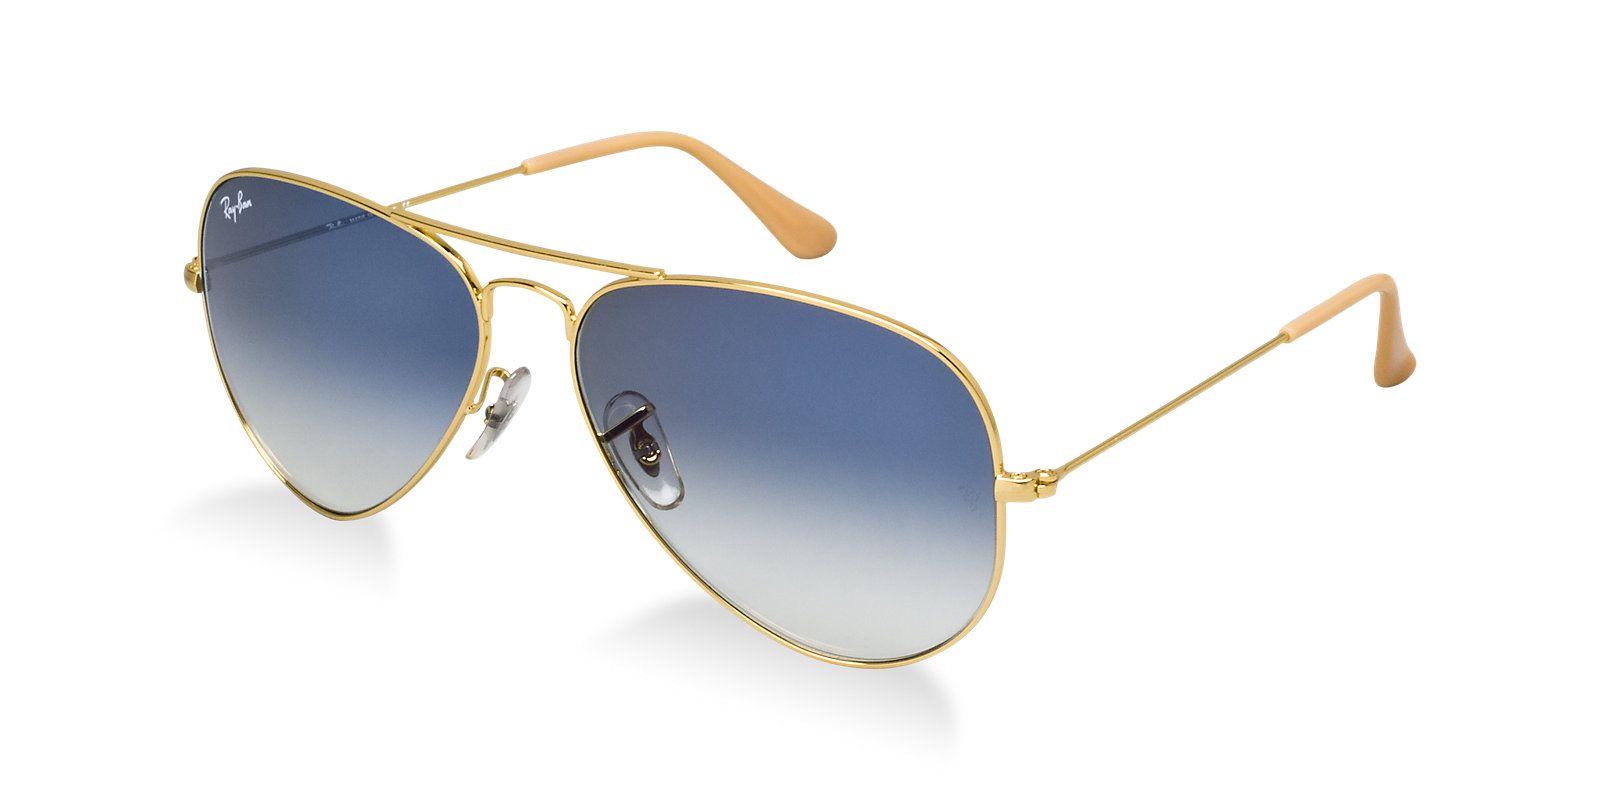 e95b1221e37 ... Ray-Ban Blue Aviator Sunglasses ( RB3025 001 3F 58-14 ) ...